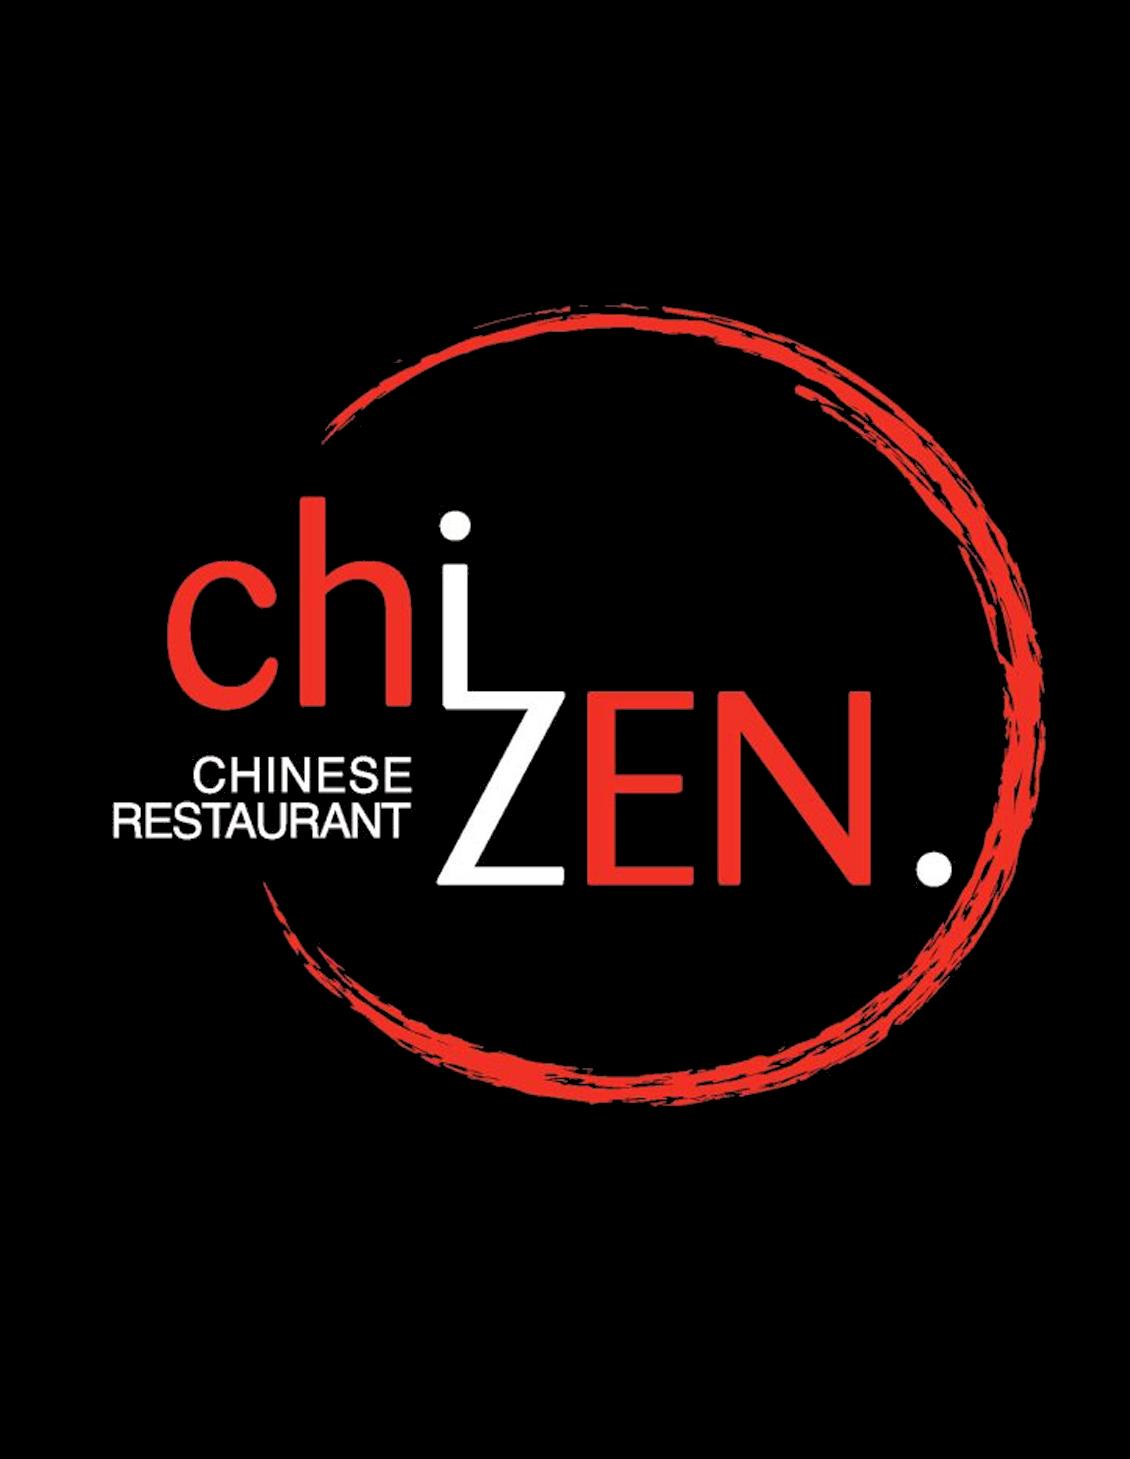 Chizen